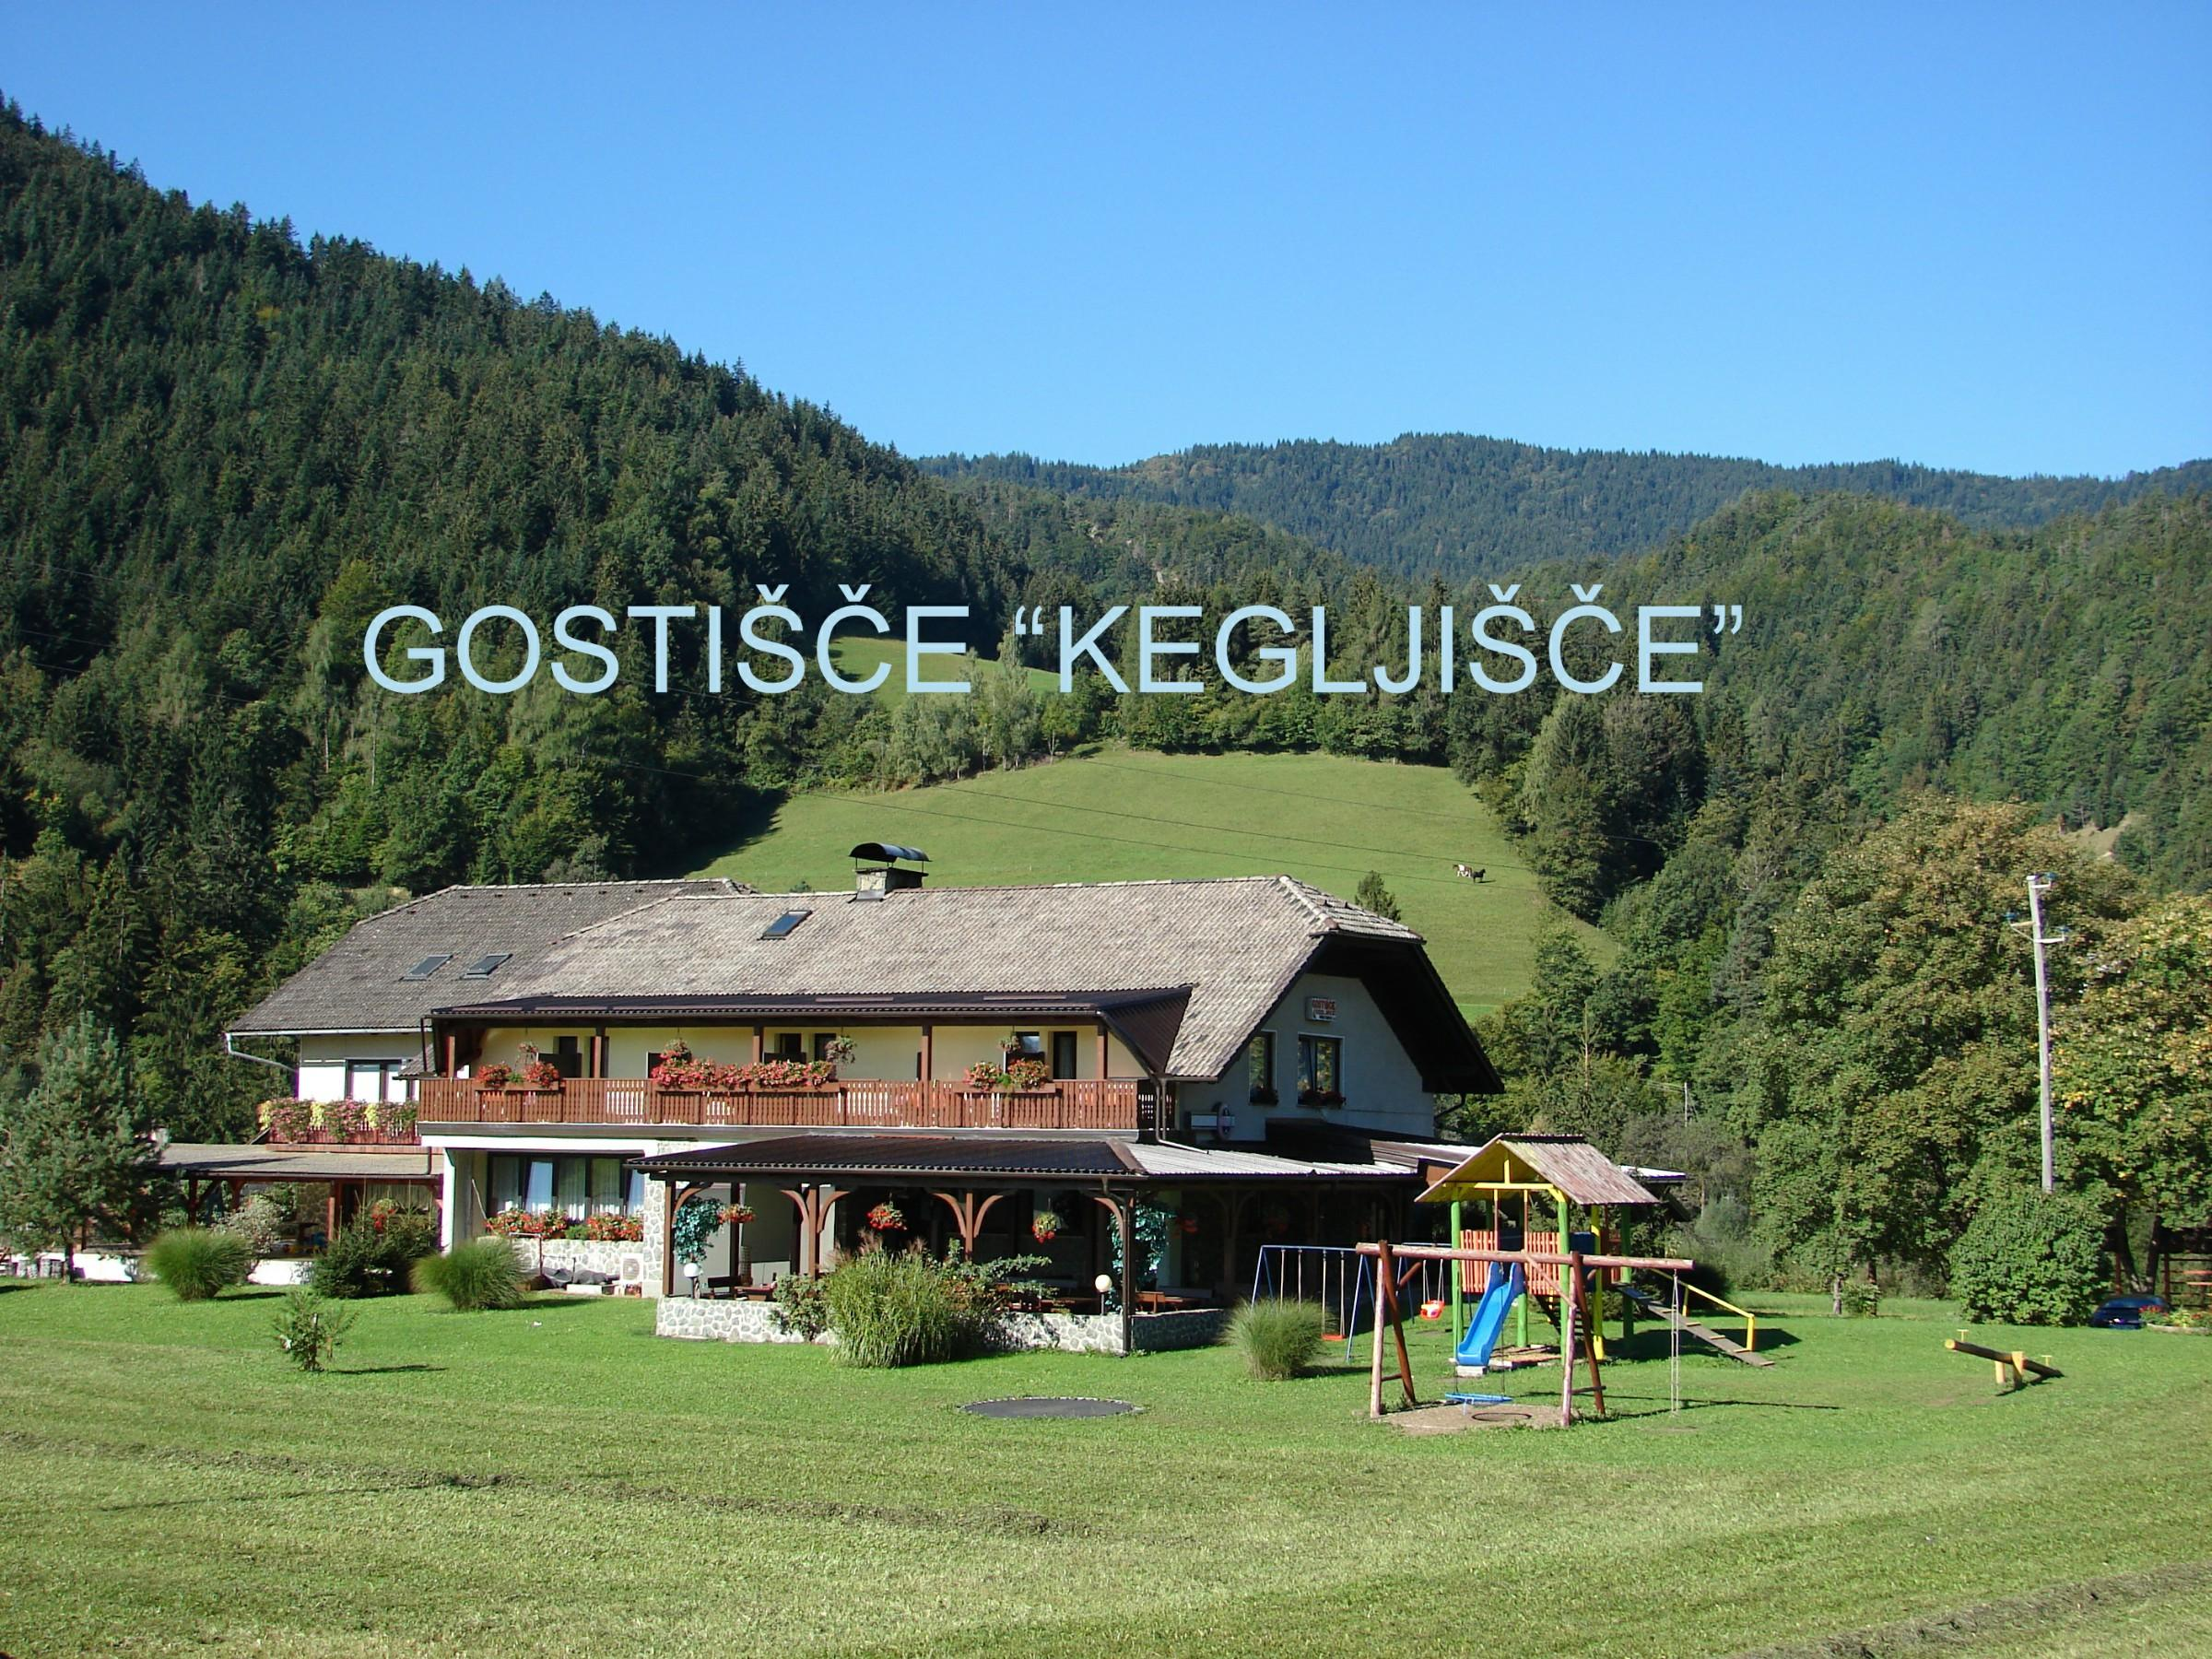 Gostisce_Kegljisce (1)